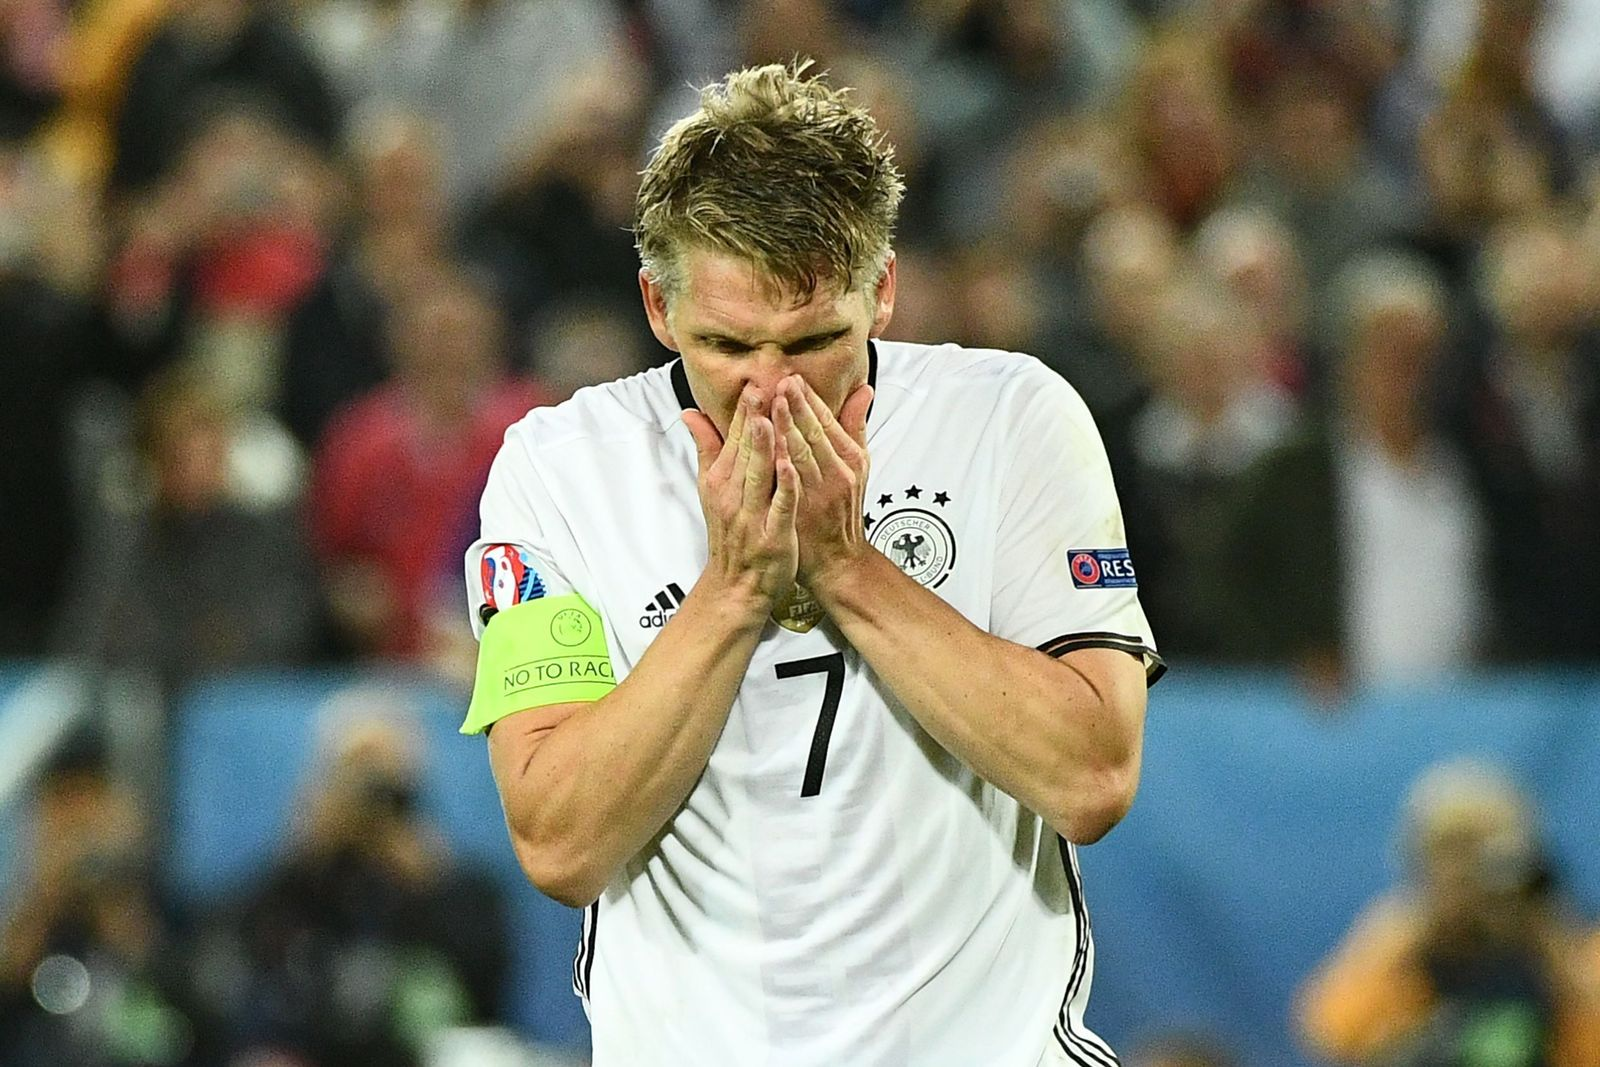 FILES-FBL-EURO-2016-GER-SCHWEINSTEIGER